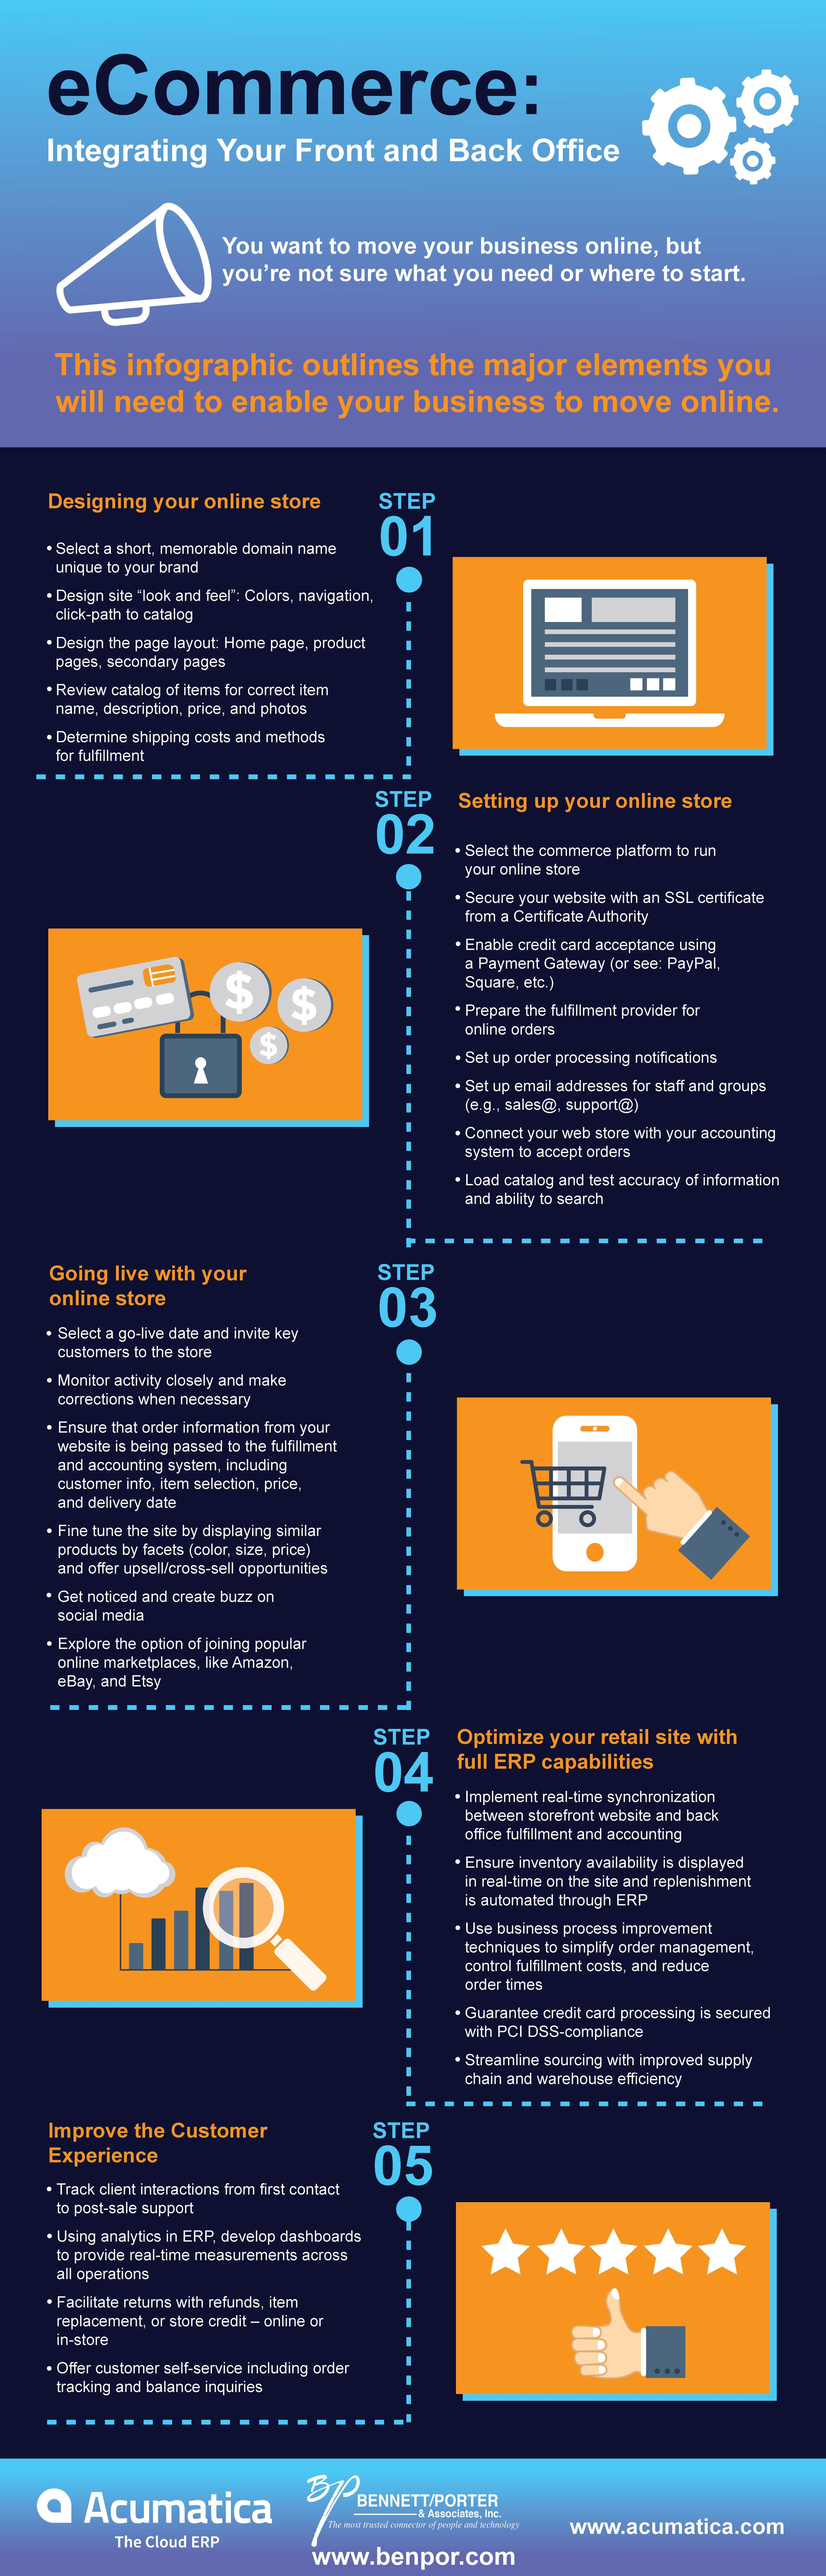 Acumatica-eCommerce Infographic w Bennett_Porter